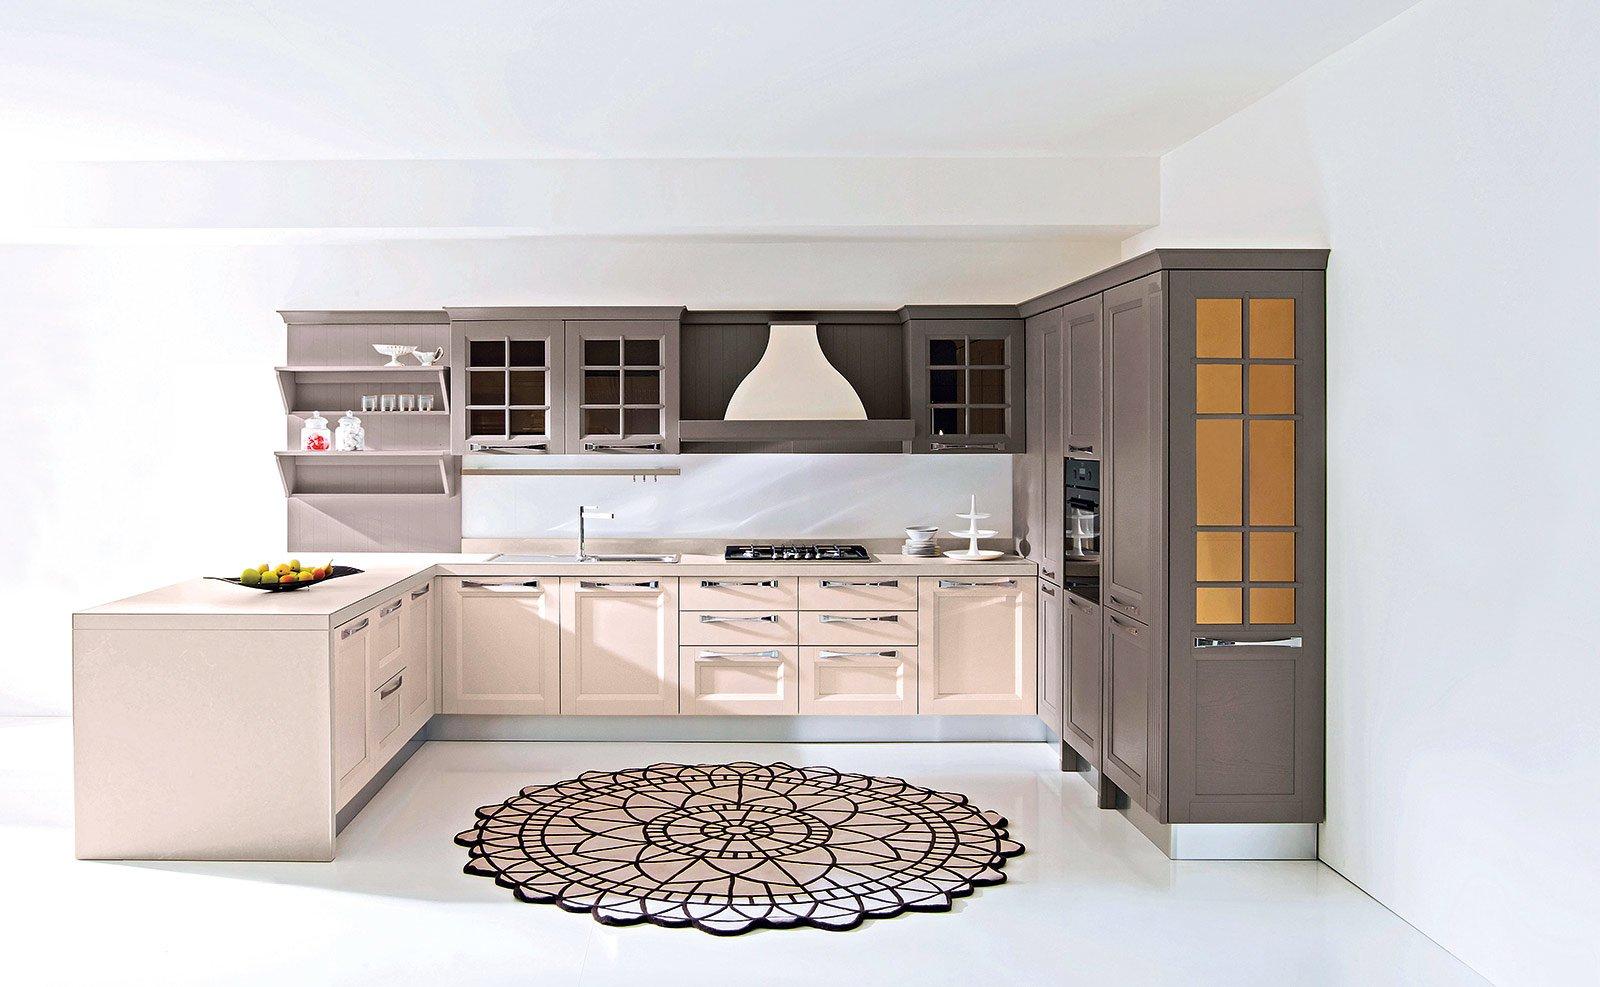 cucine country: stile tradizionale o new classic - cose di casa - Cucine Country Bianche